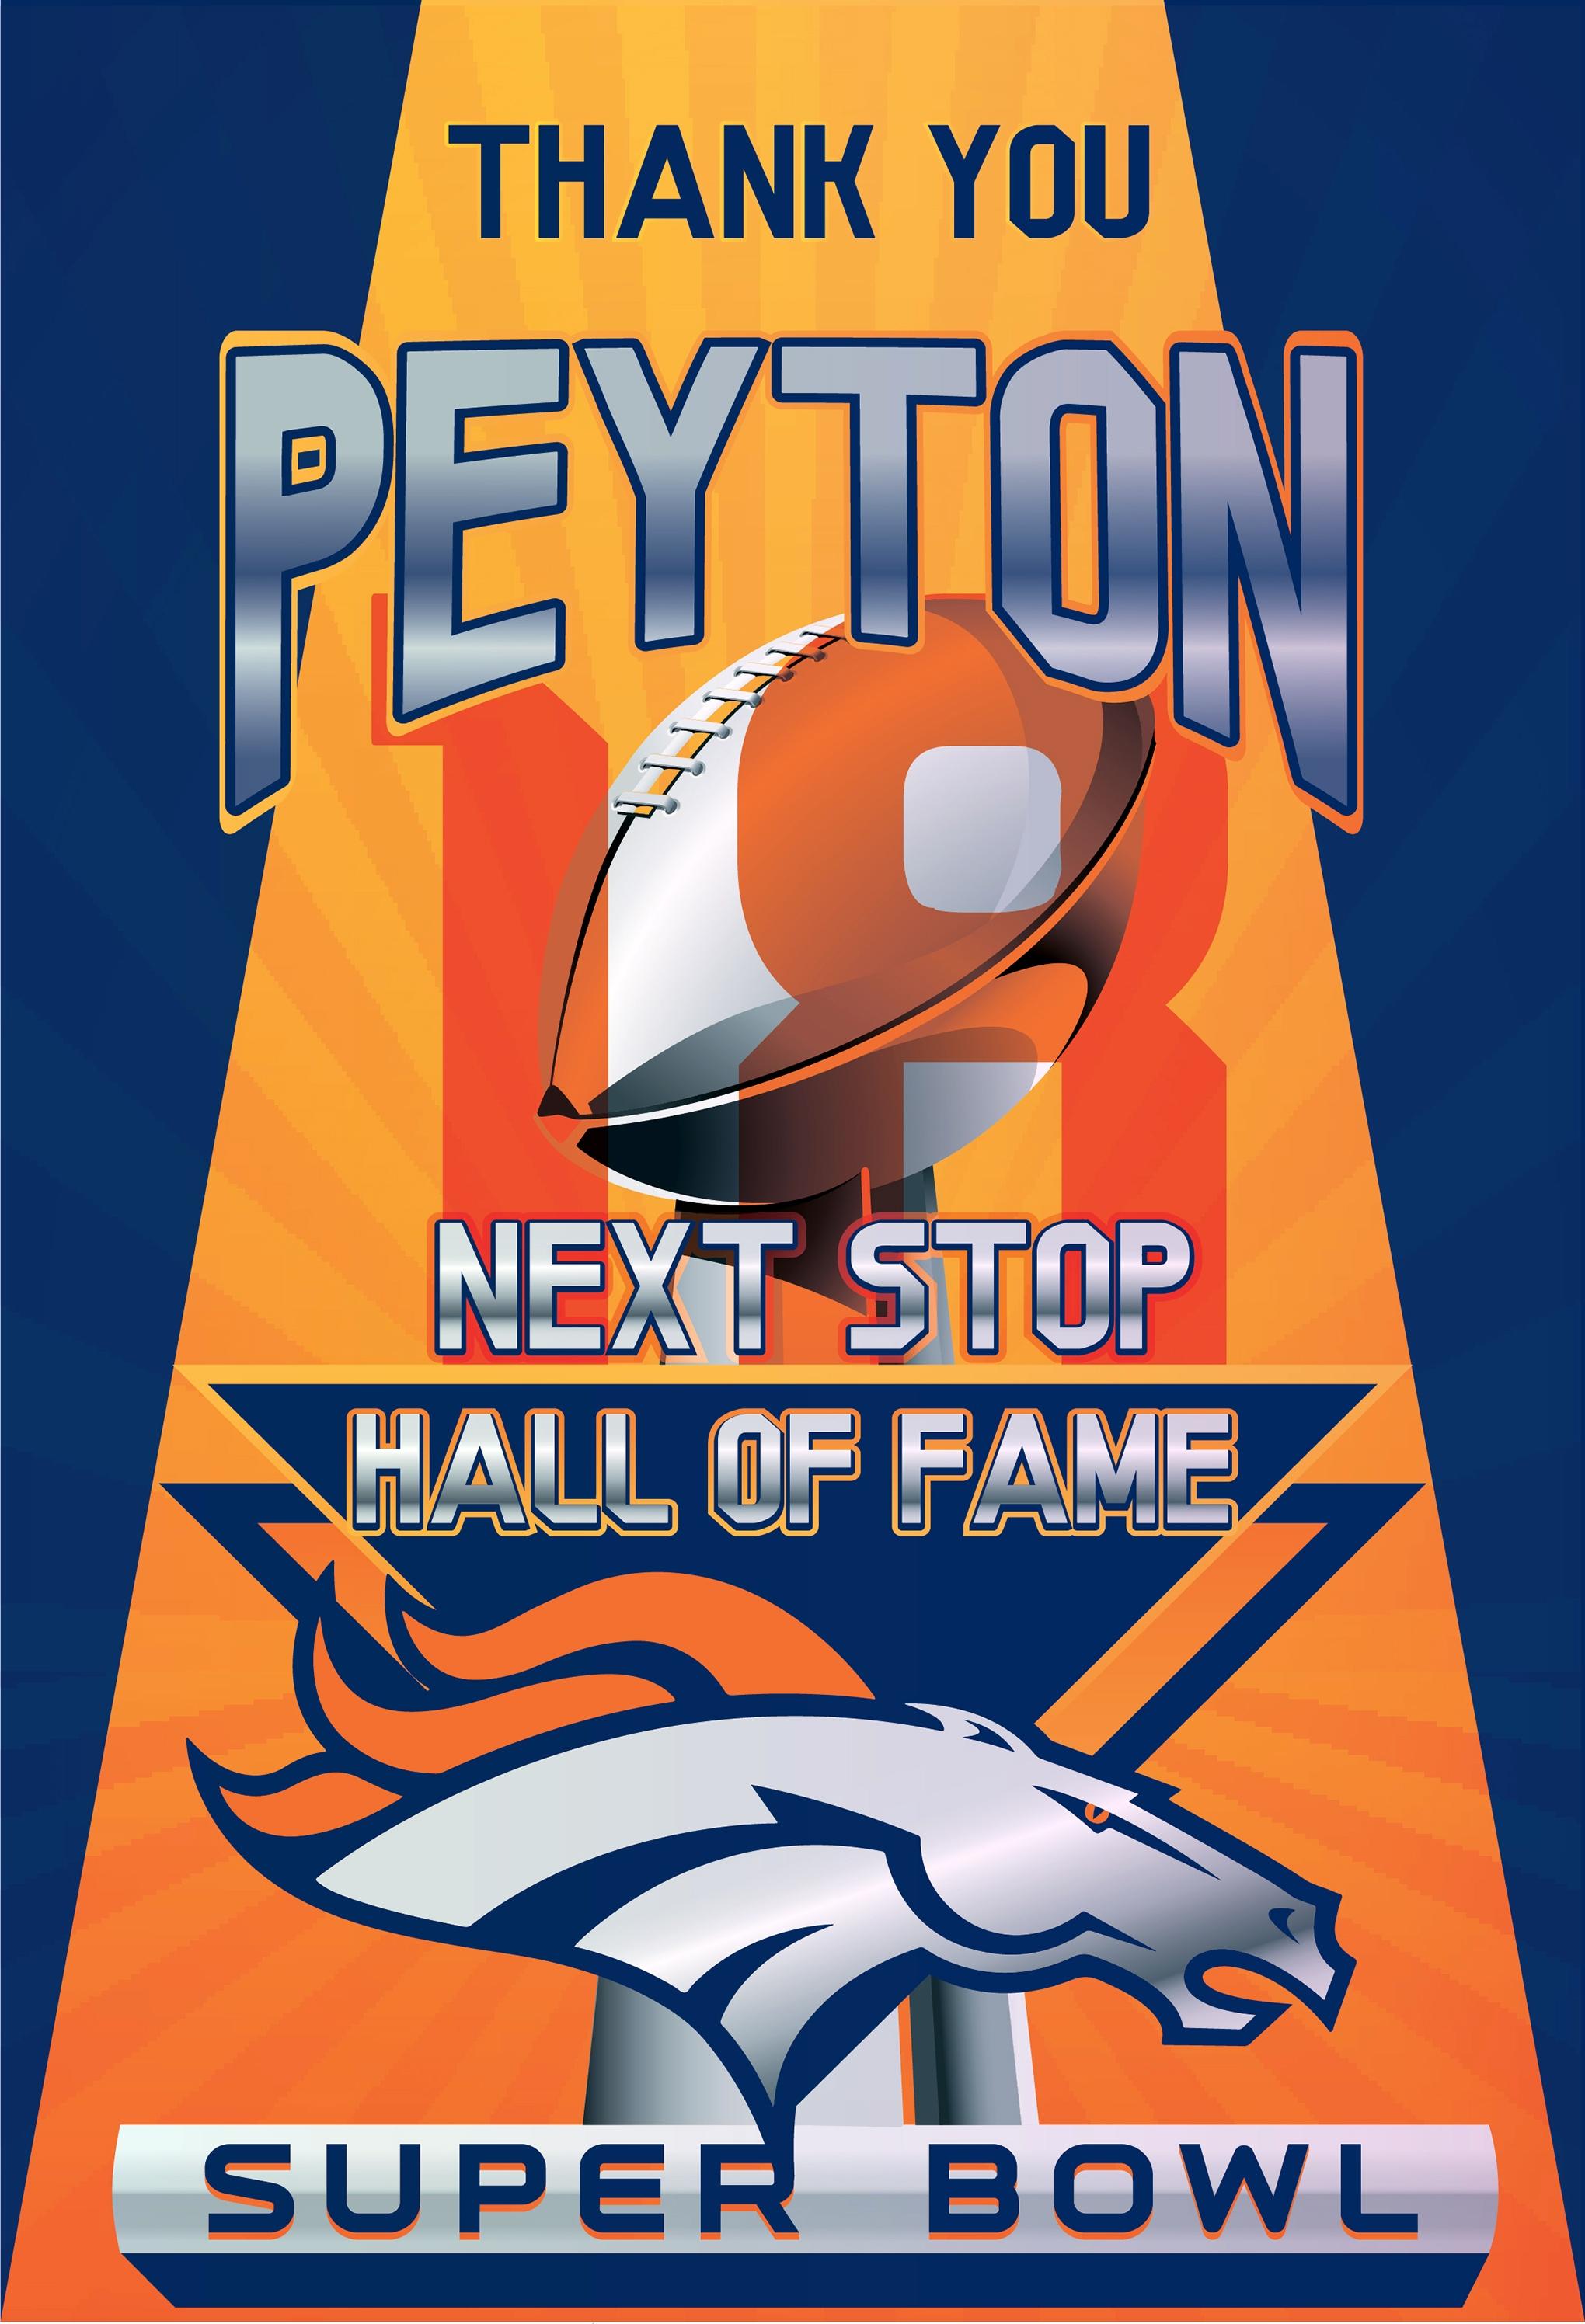 Denver Broncos, Peyton Manning Super Bowl Poster